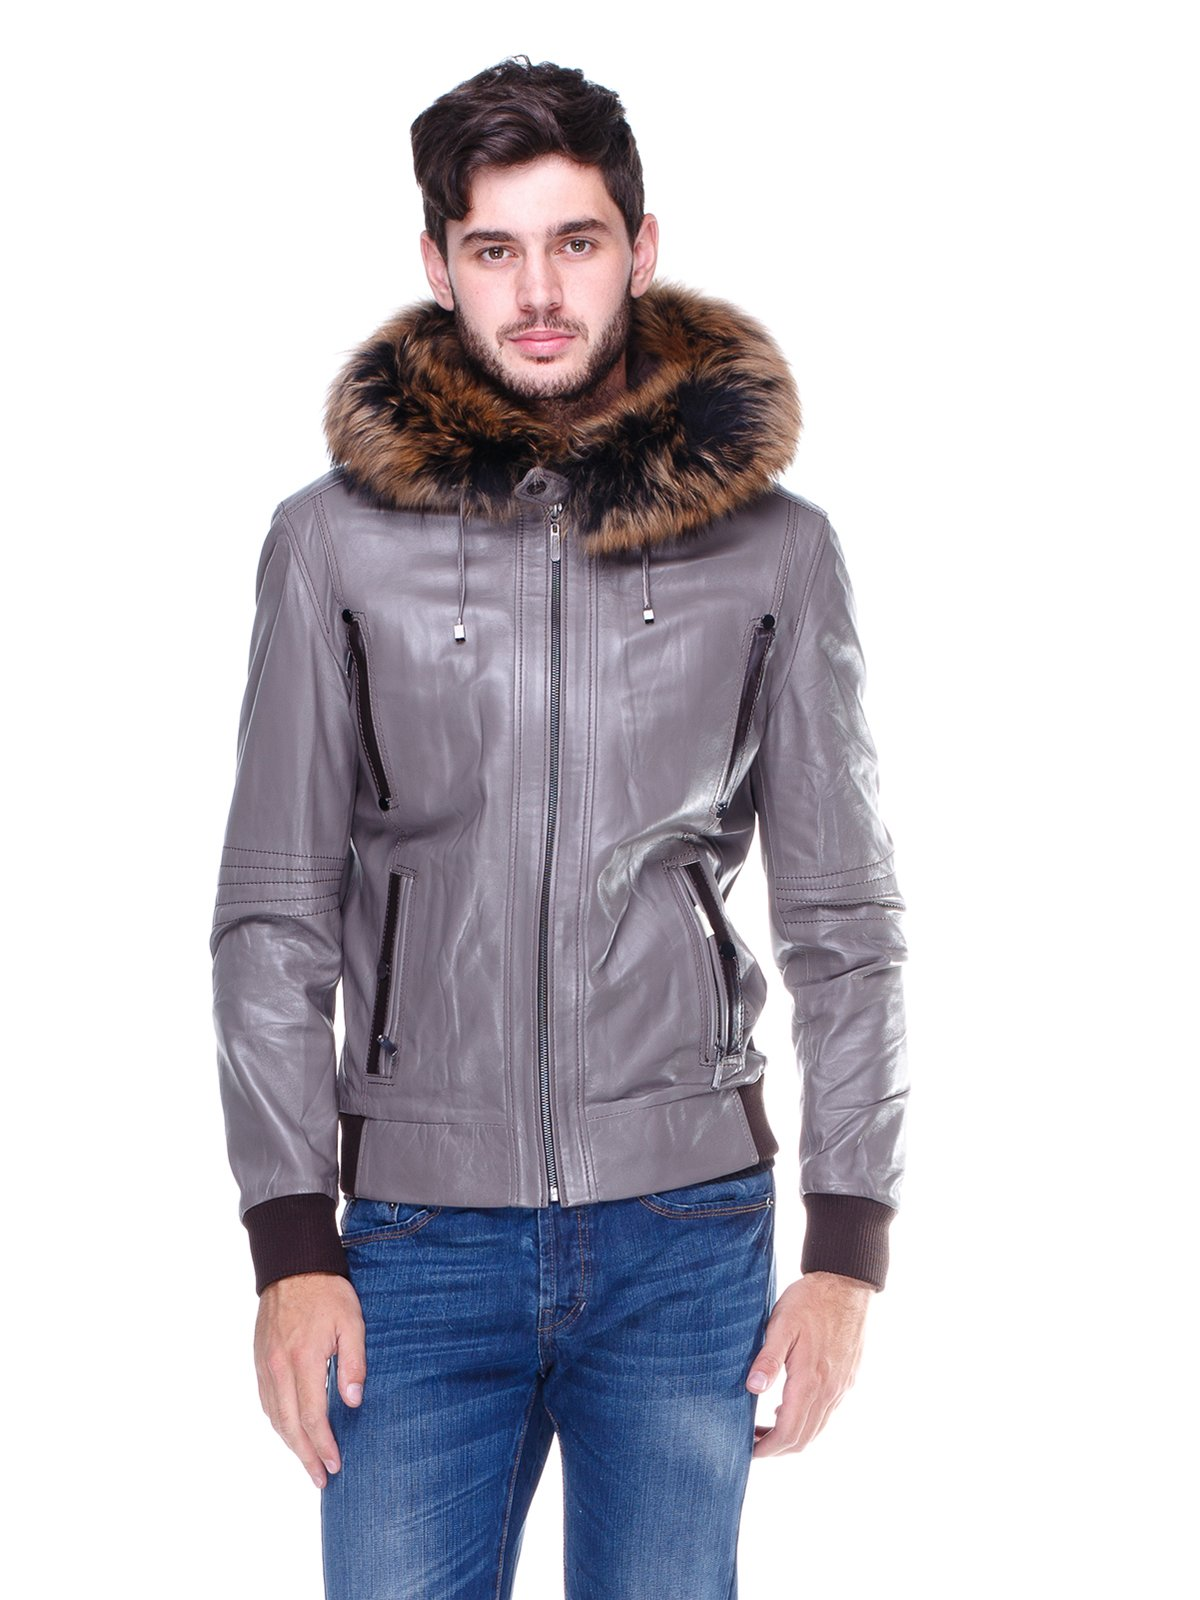 Куртка сіра з оздобленим хутром капюшоном   1830354